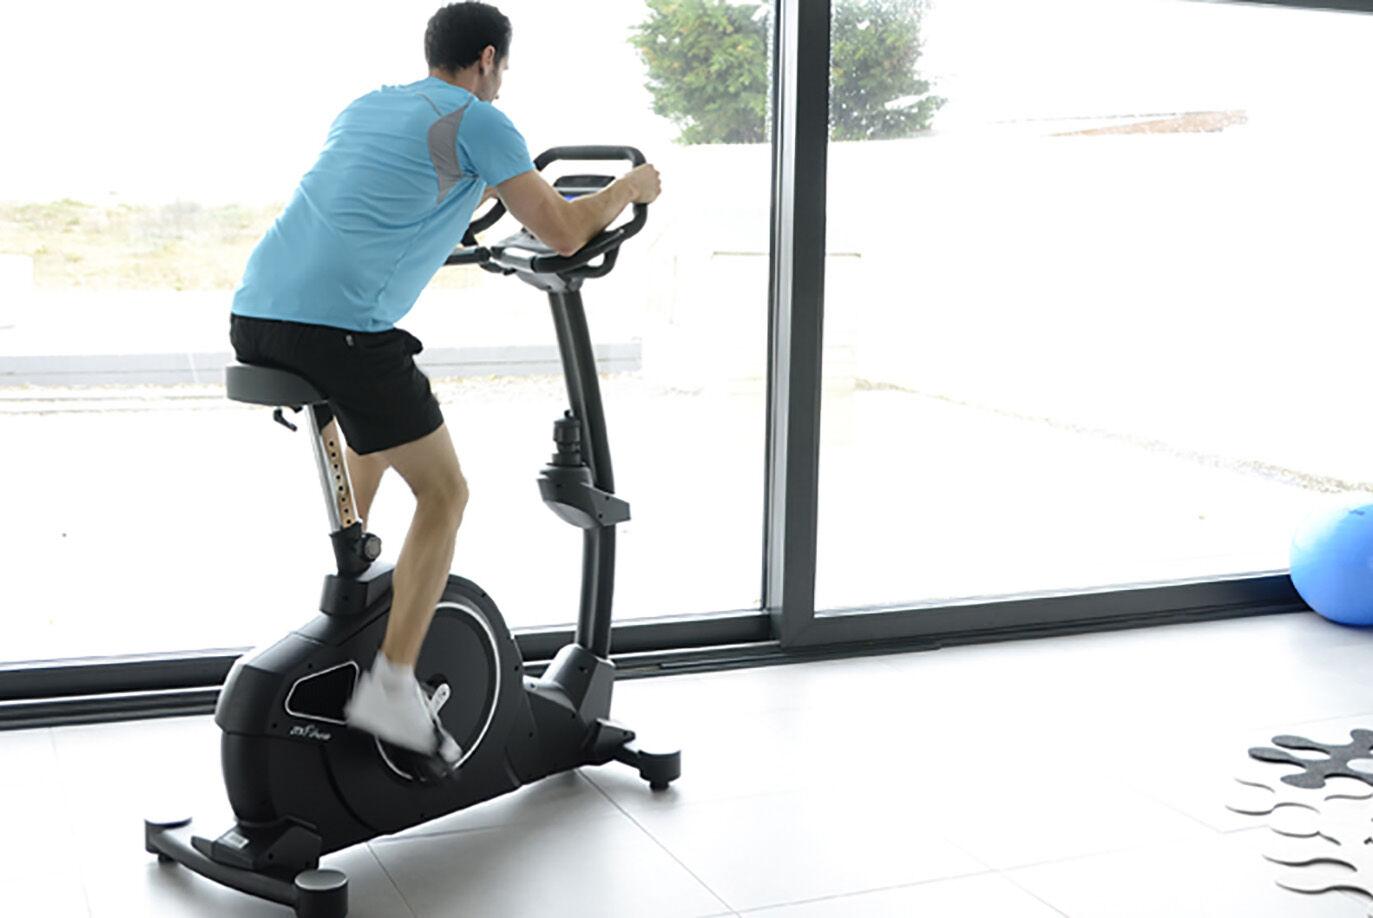 Self Powered Exercise Bike | JTX Fitness